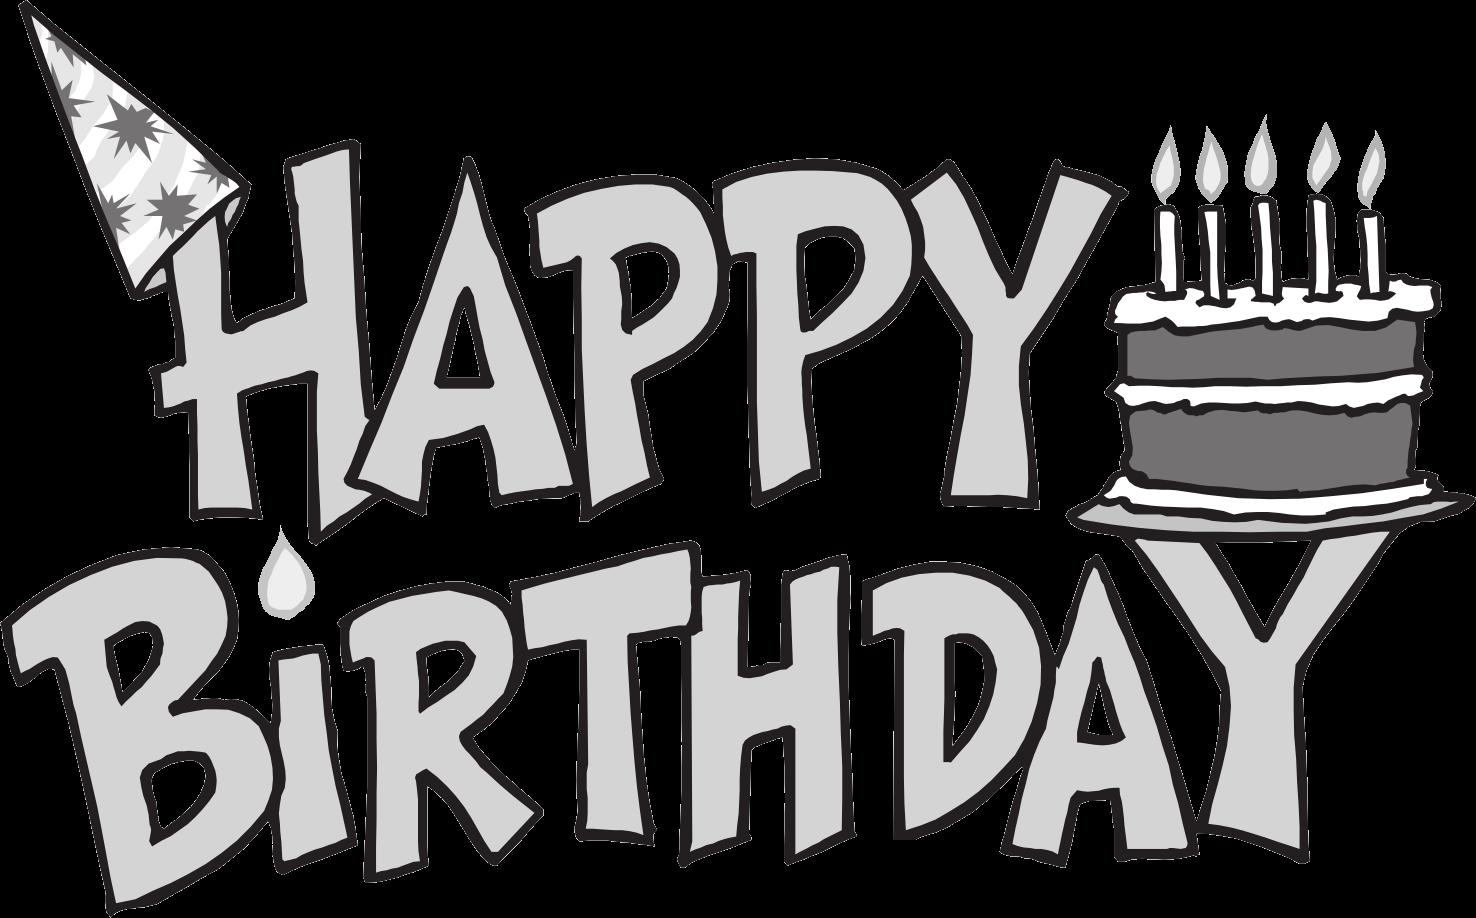 Birthday clipart black & white clip Free Birthday Cliparts Black, Download Free Clip Art, Free Clip Art ... clip